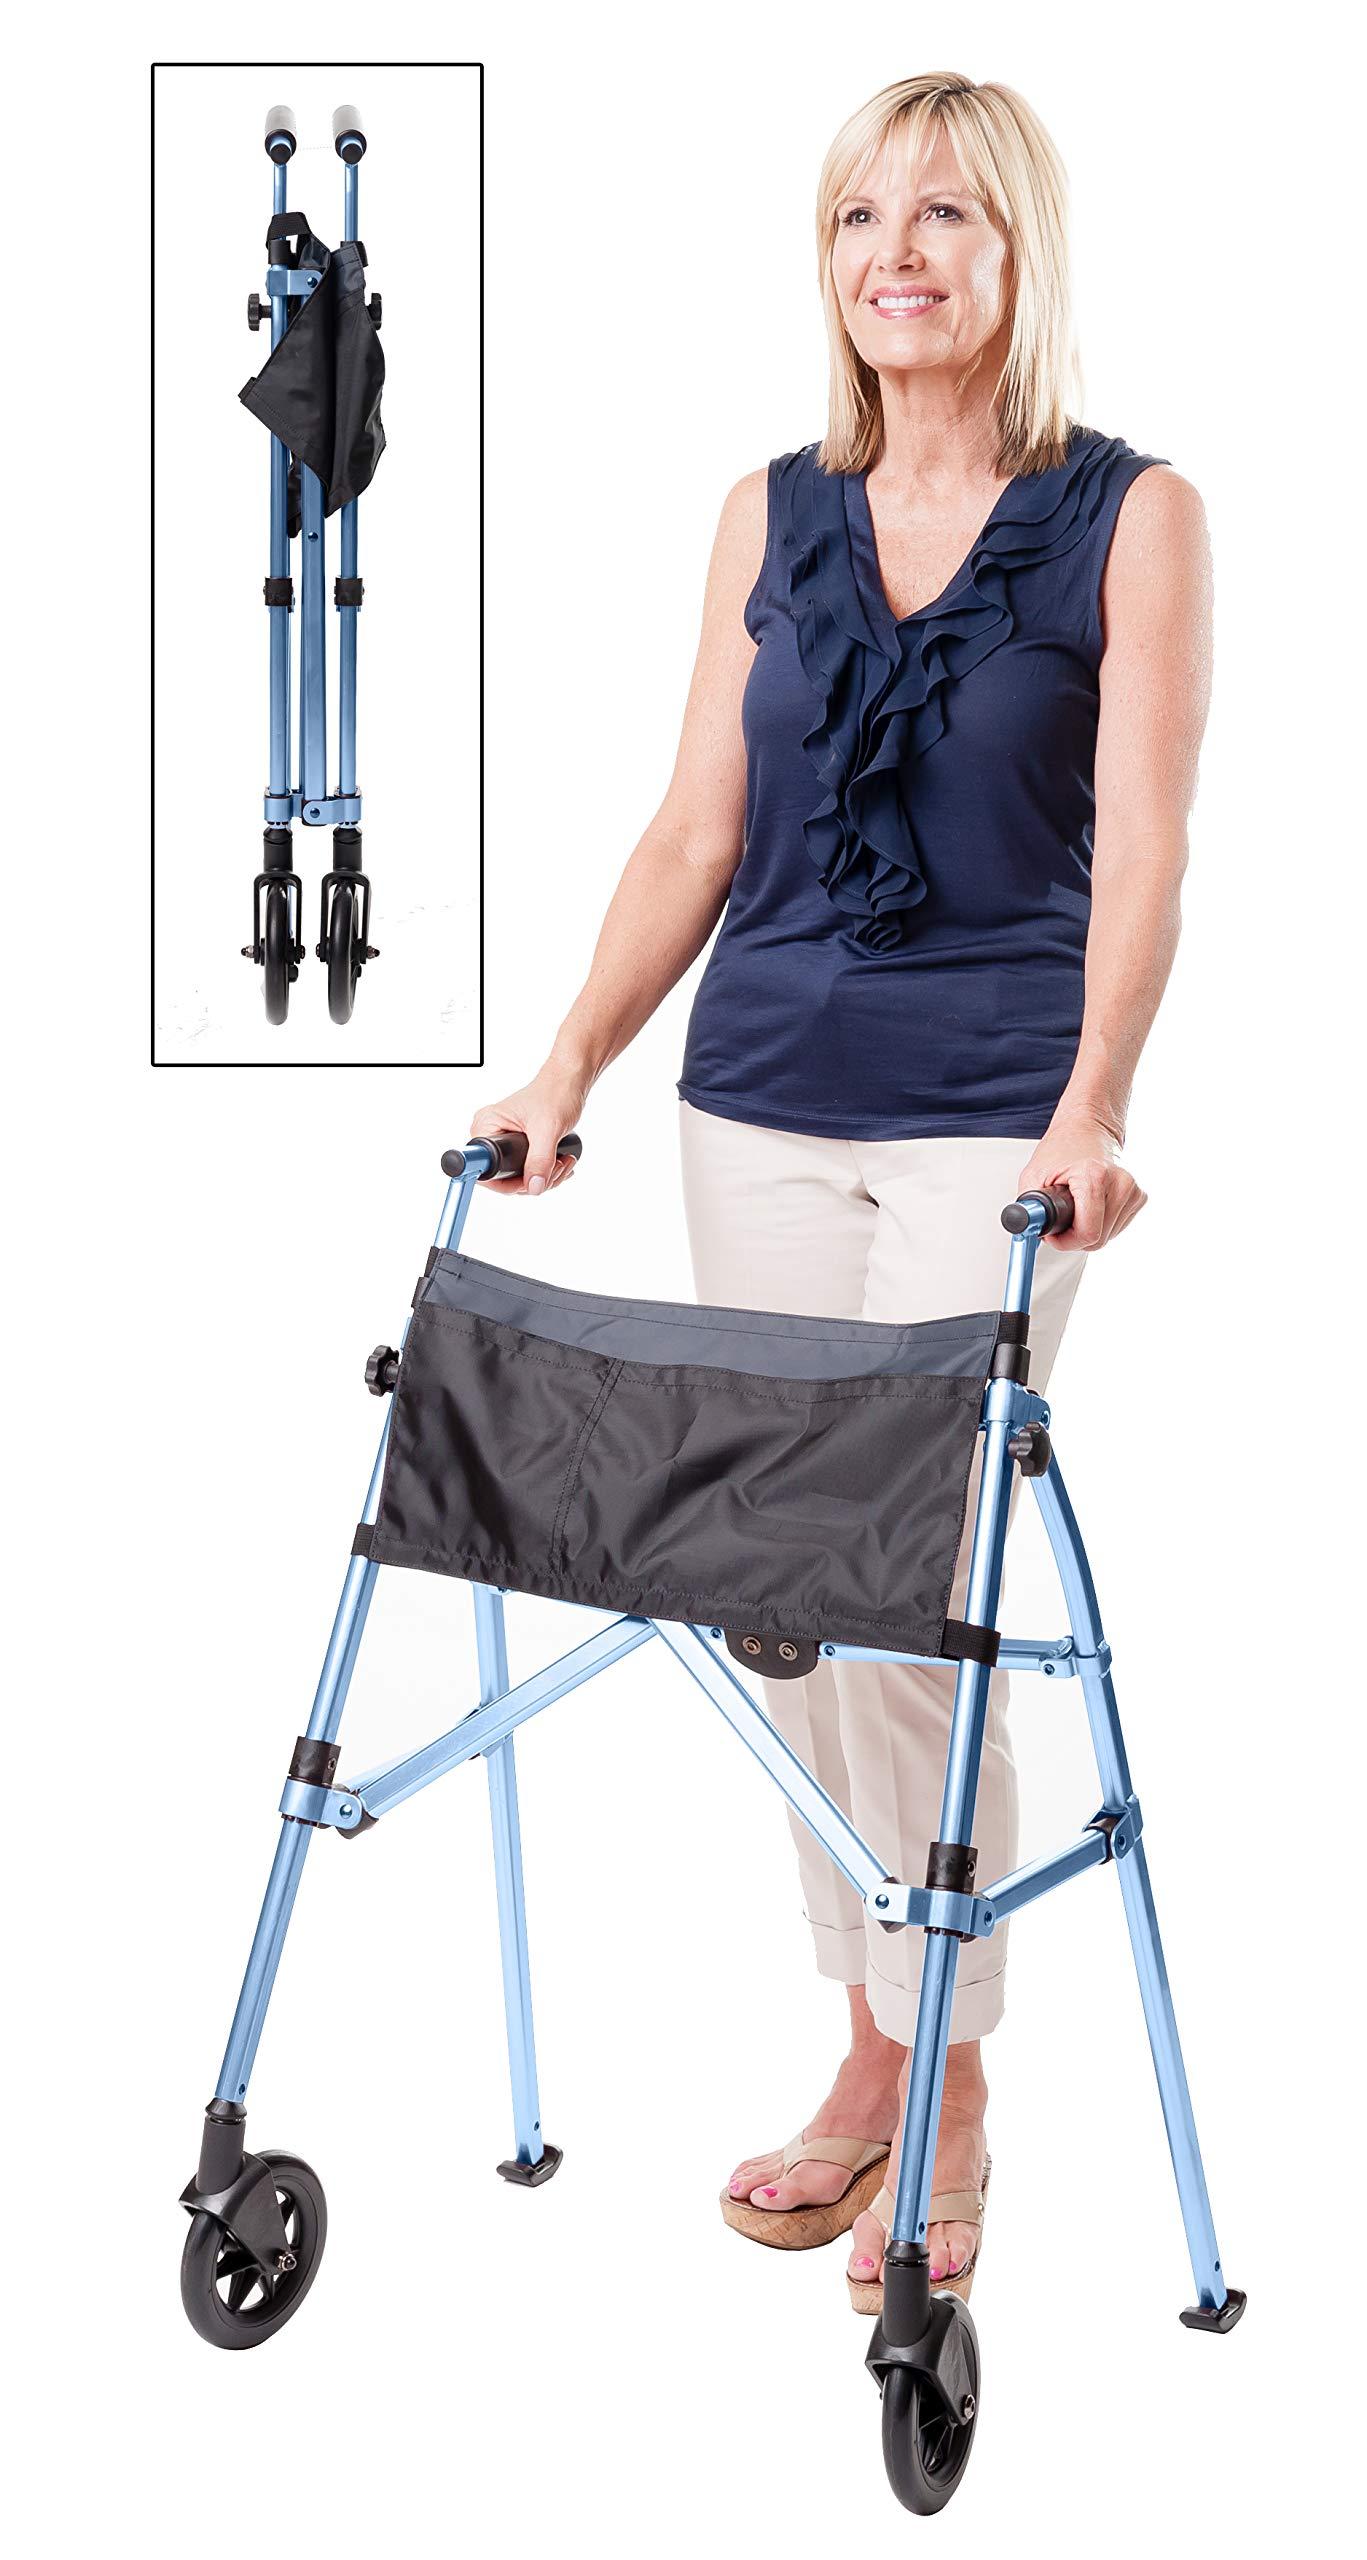 Stander EZ Fold-N-Go Walker, Lightweight Folding & Narrow Adult Travel Walker with Wheels for Seniors, Cobalt Blue by Stander